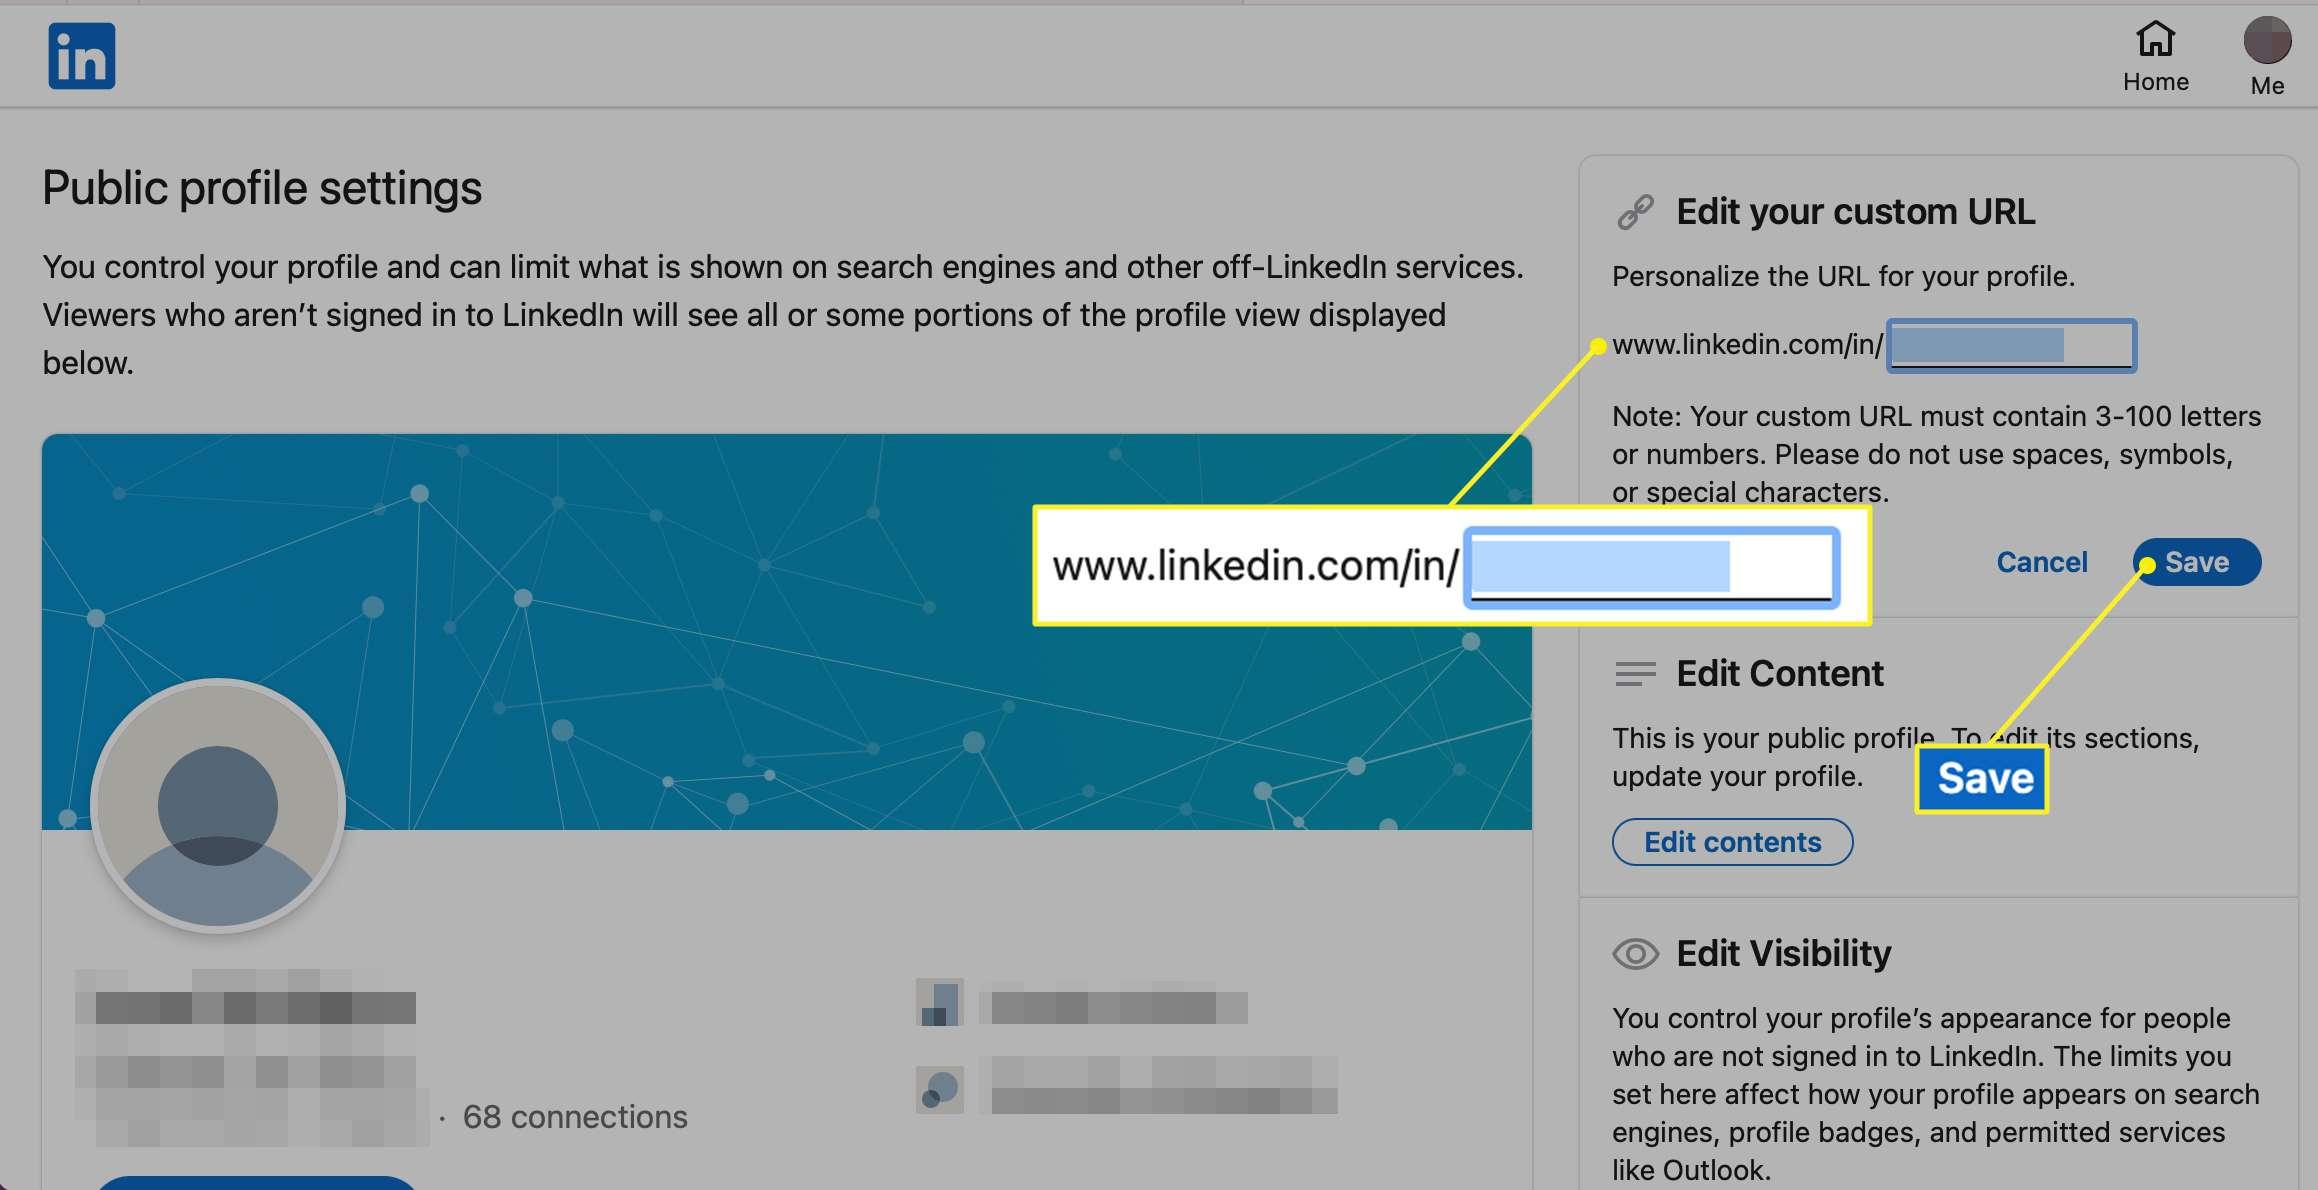 Edit your custom URL section in LinkedIn